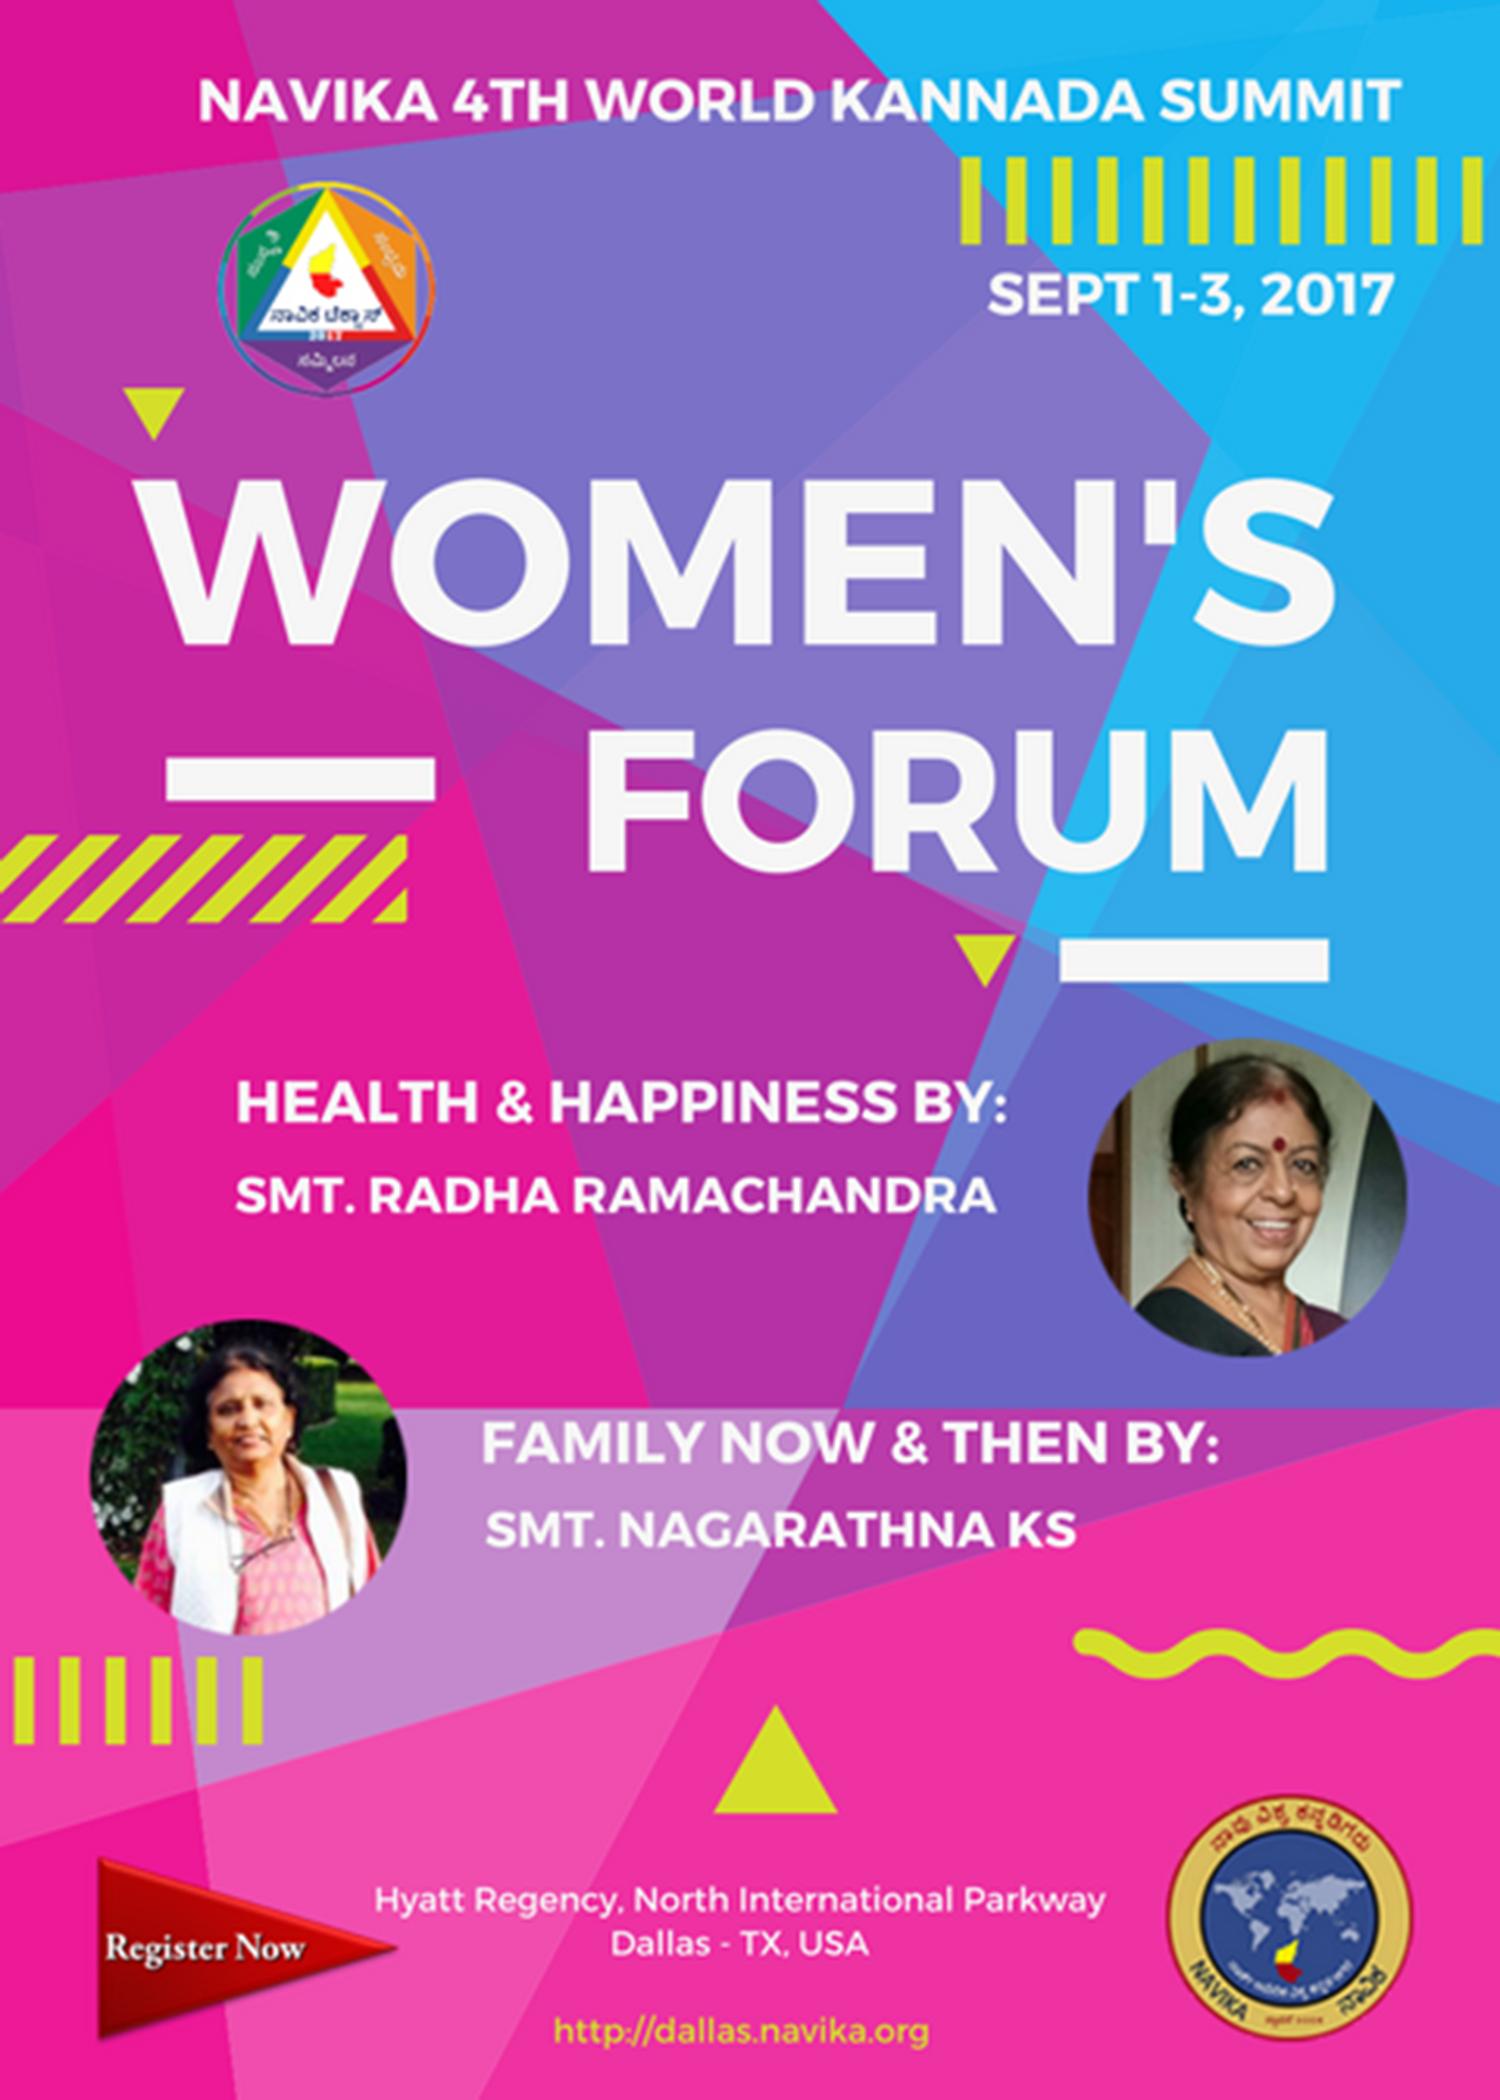 Women's Forum @ Navika 2017